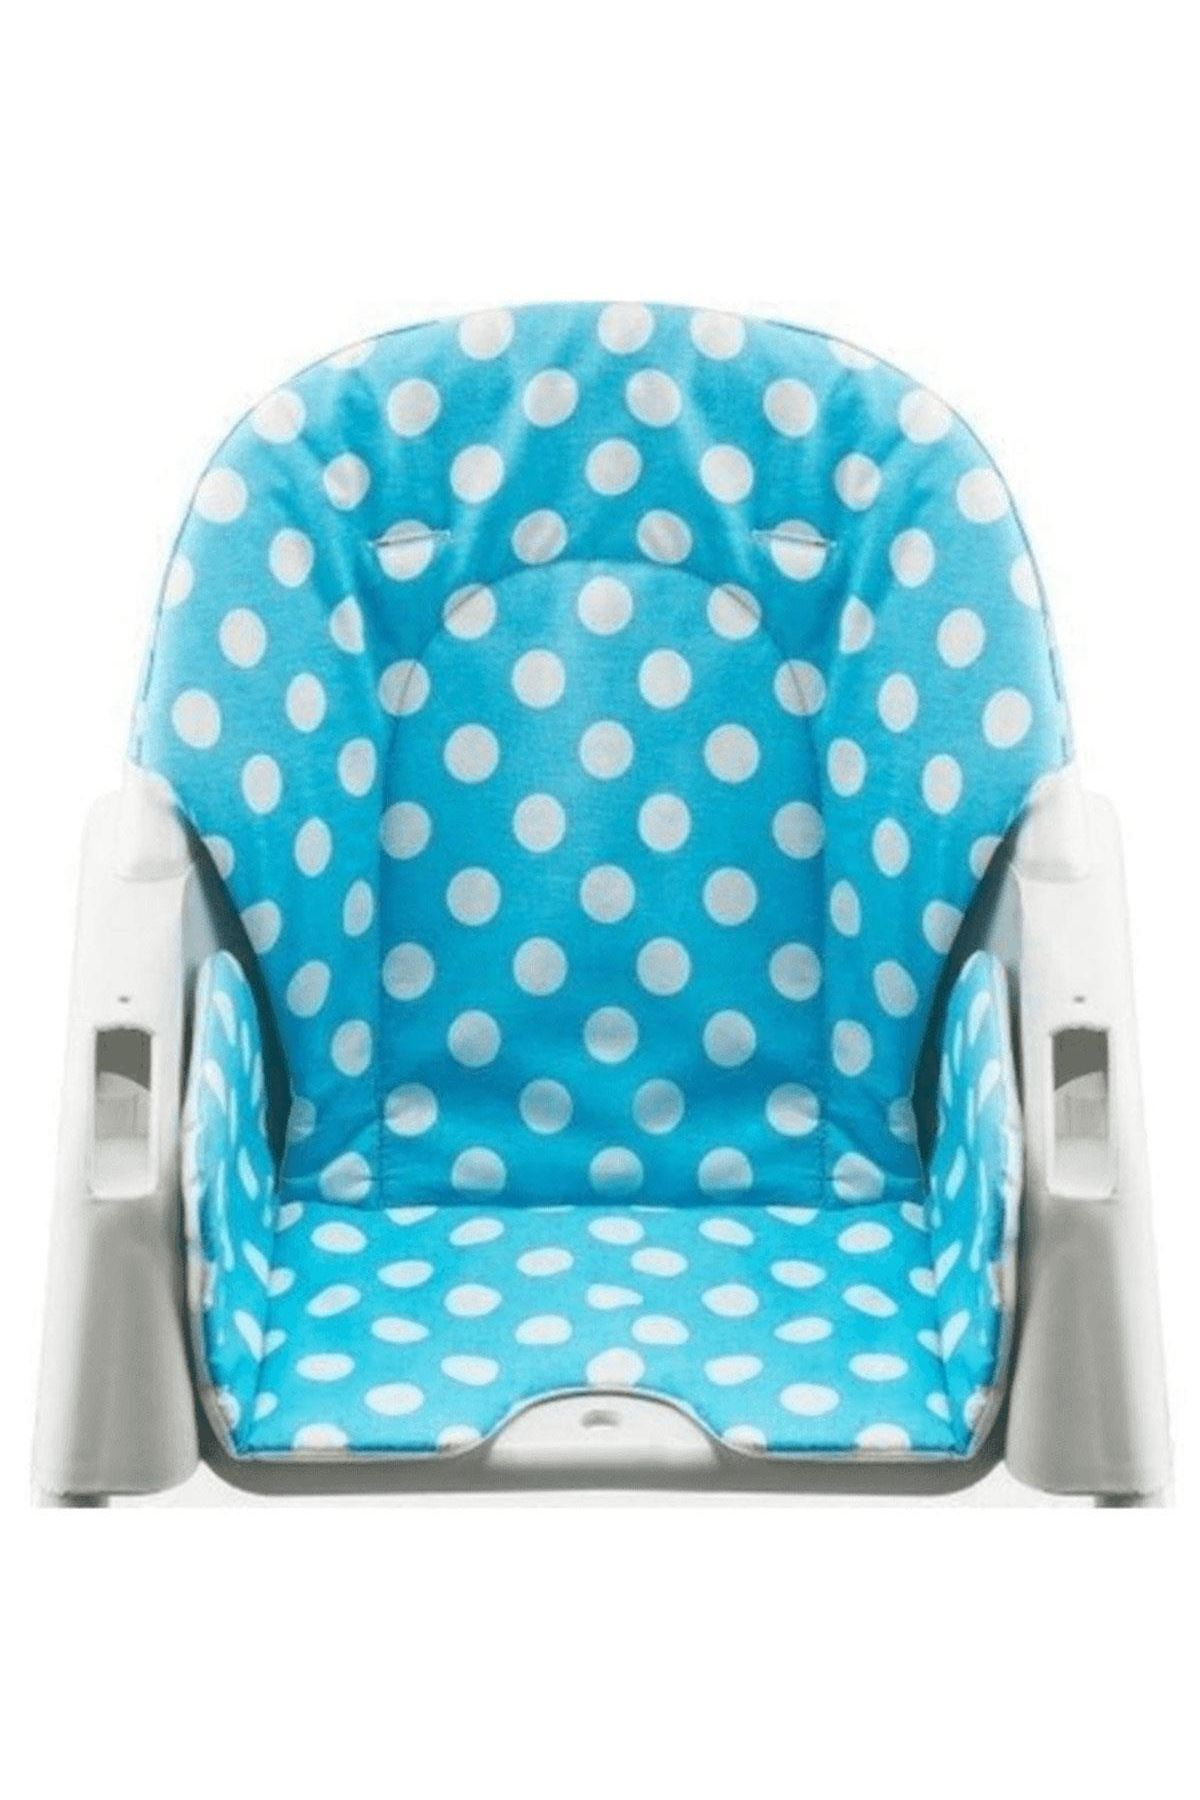 Moje Mama Sandalyesi Minderi Puanlı Mavi